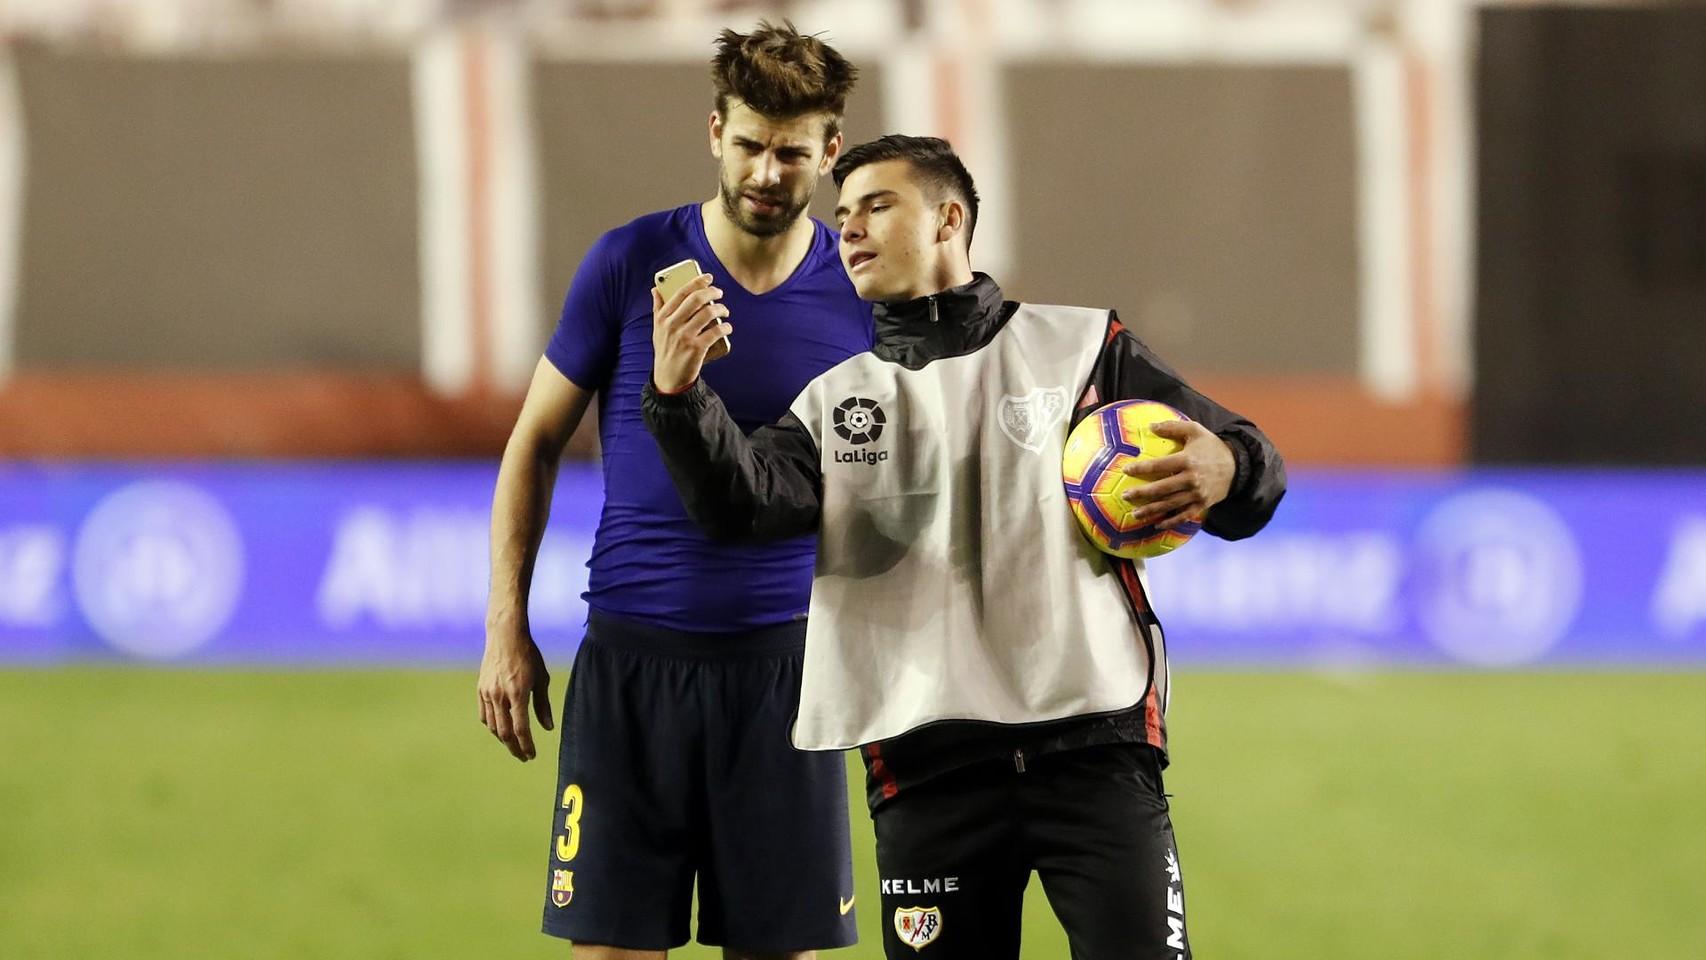 صور مباراة : رايو فاليكانو - برشلونة 2-3 ( 03-11-2018 )  102064165